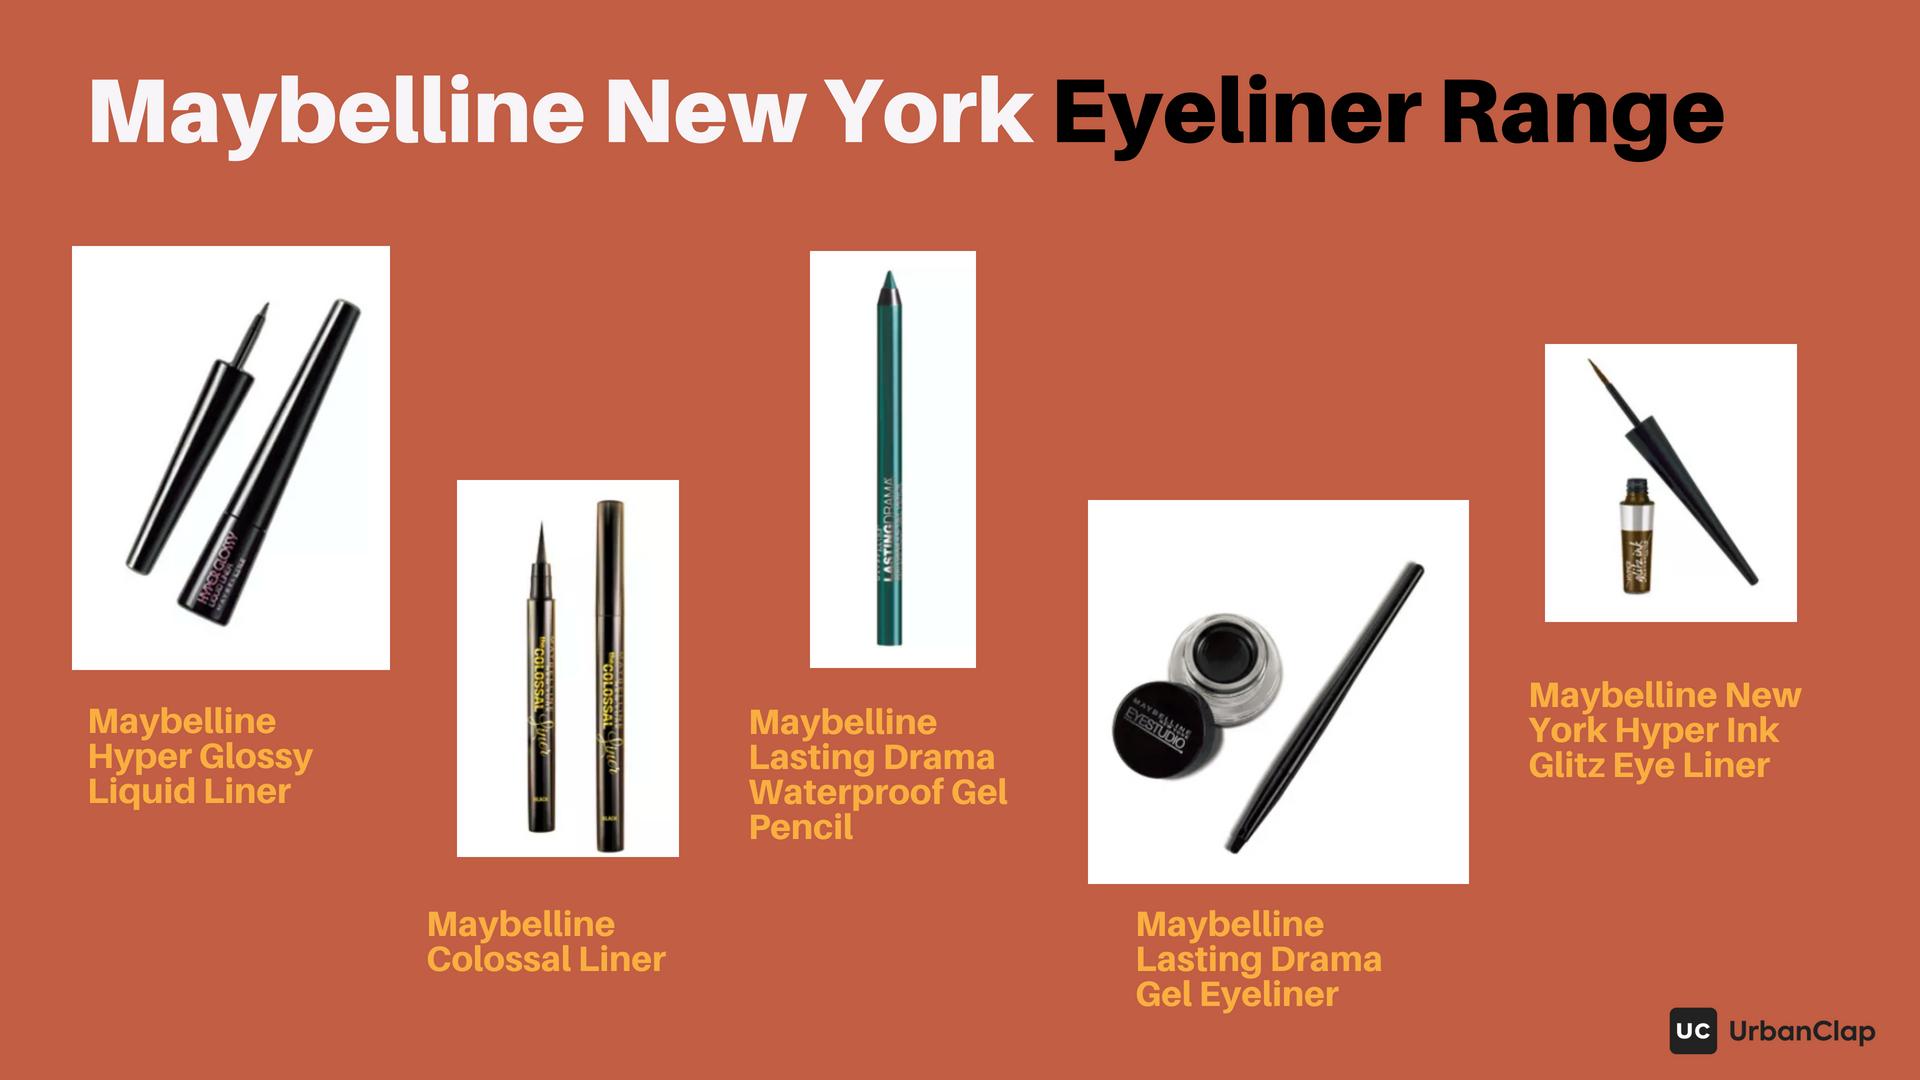 Maybelline Eyeliner Range, including liquid and pencil eyeliners